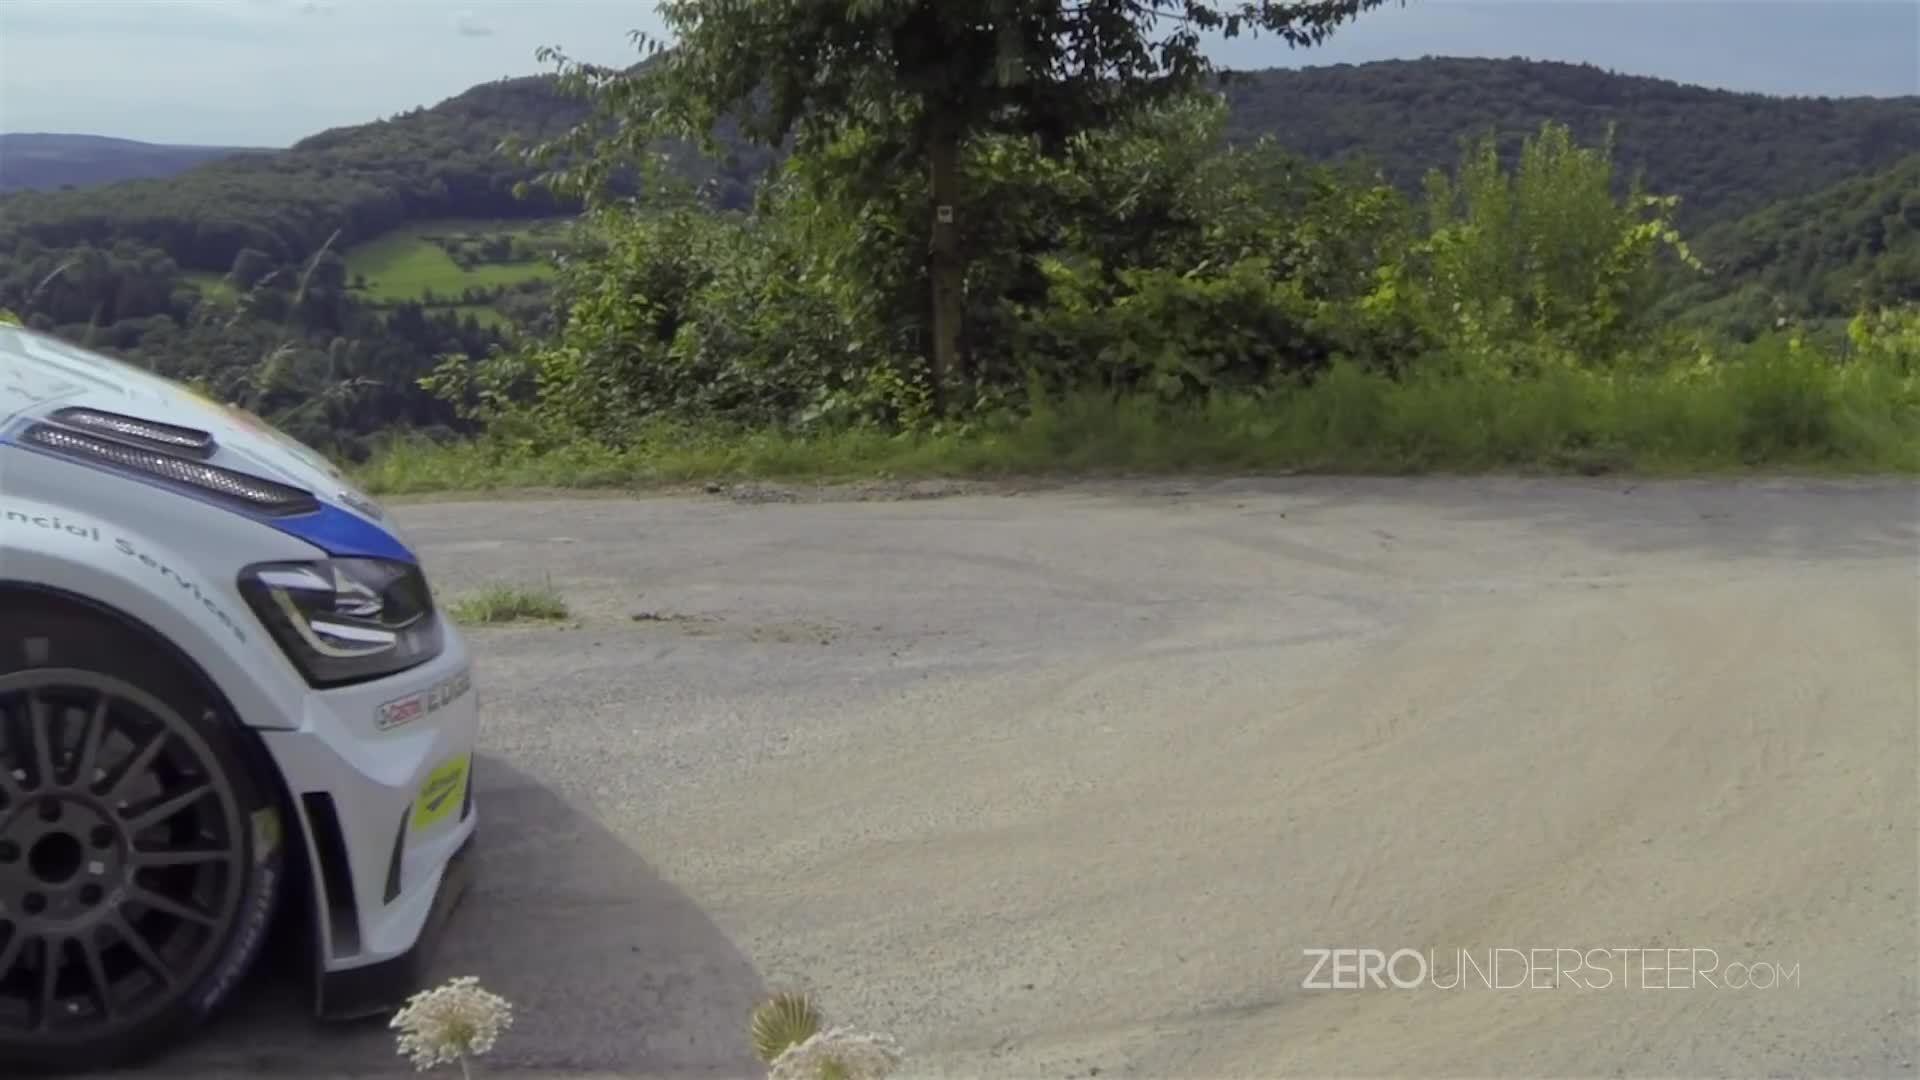 gif, gif_to_gyf, Jari-Matti Latvala Slow Motion Hairpin @ 2014 Rallye Deutschland GIFs